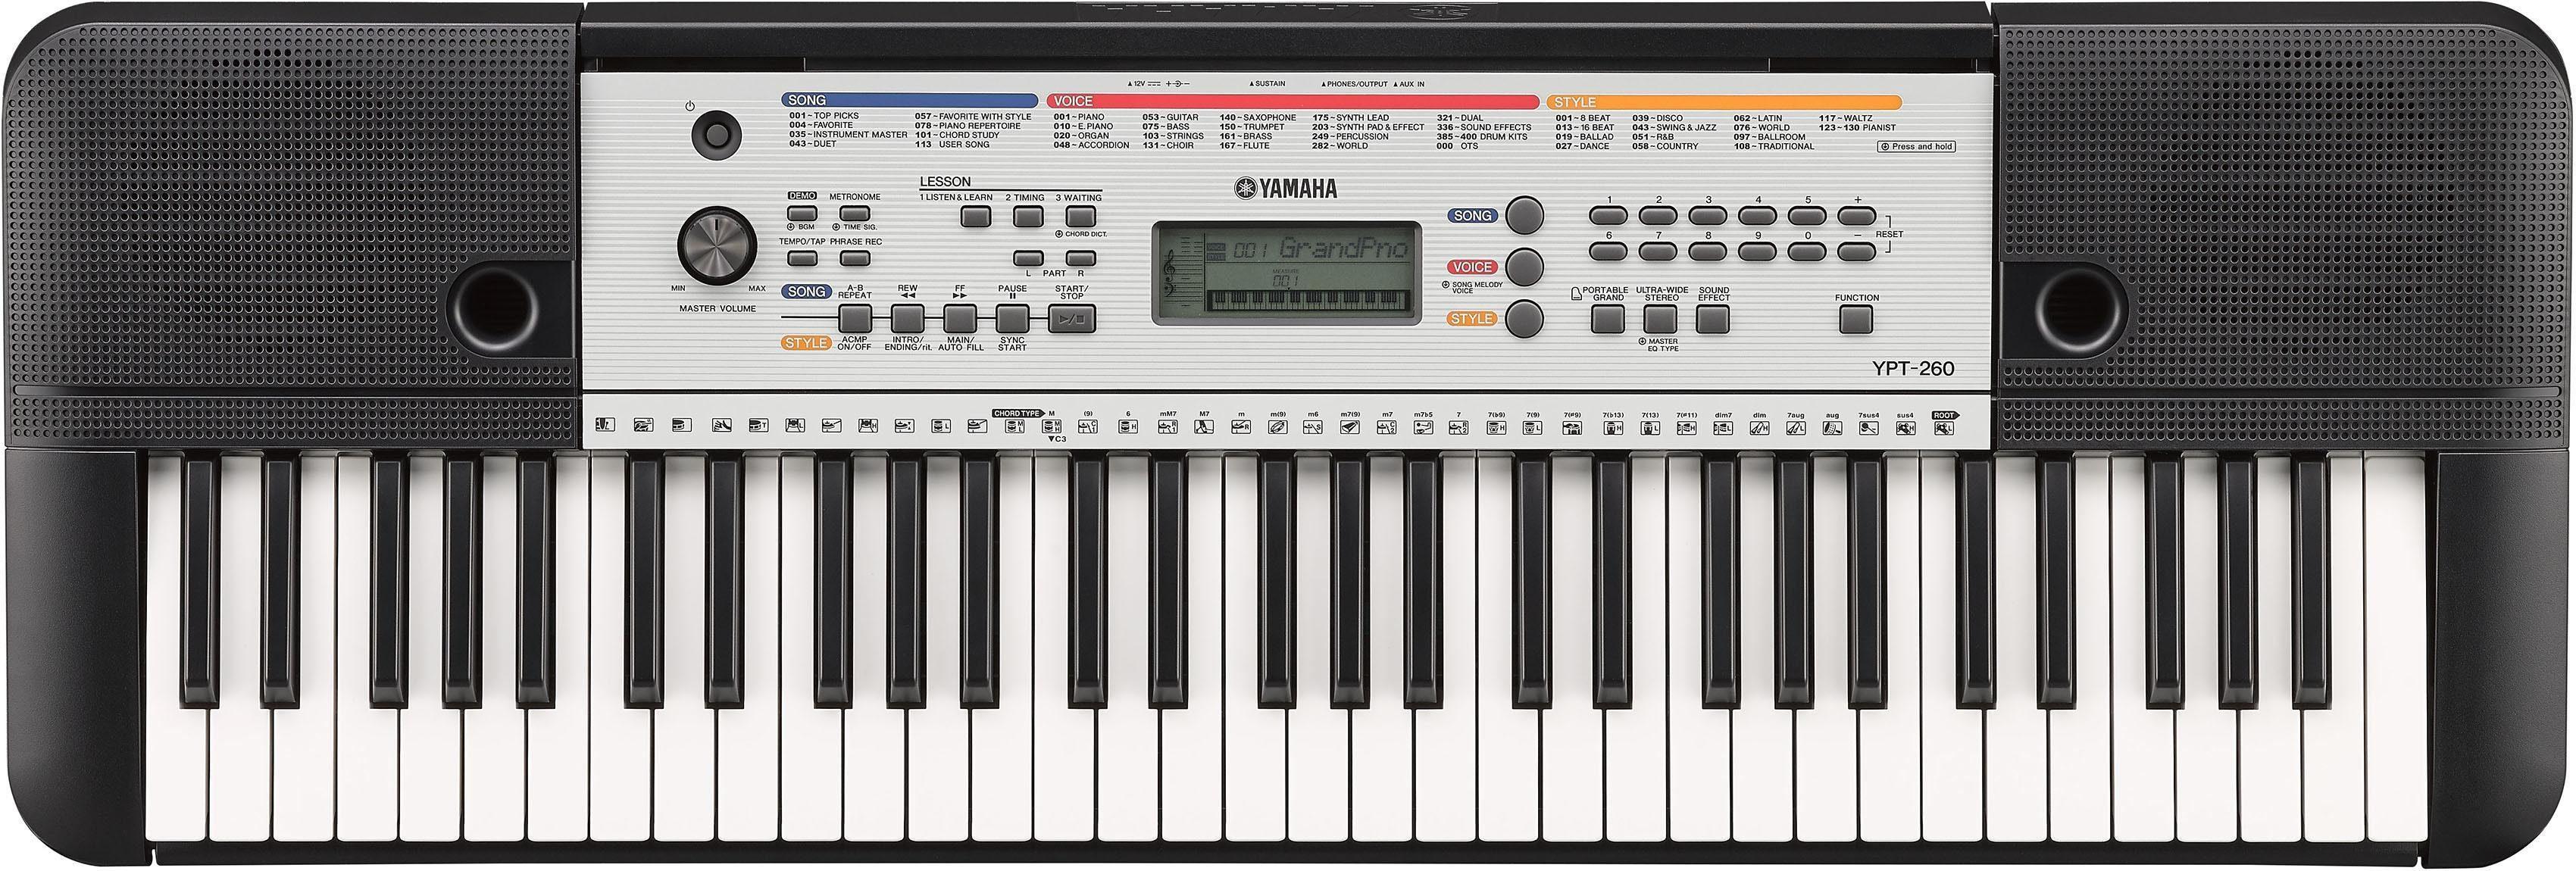 Yamaha Digital Keyboard, »YPT-260«